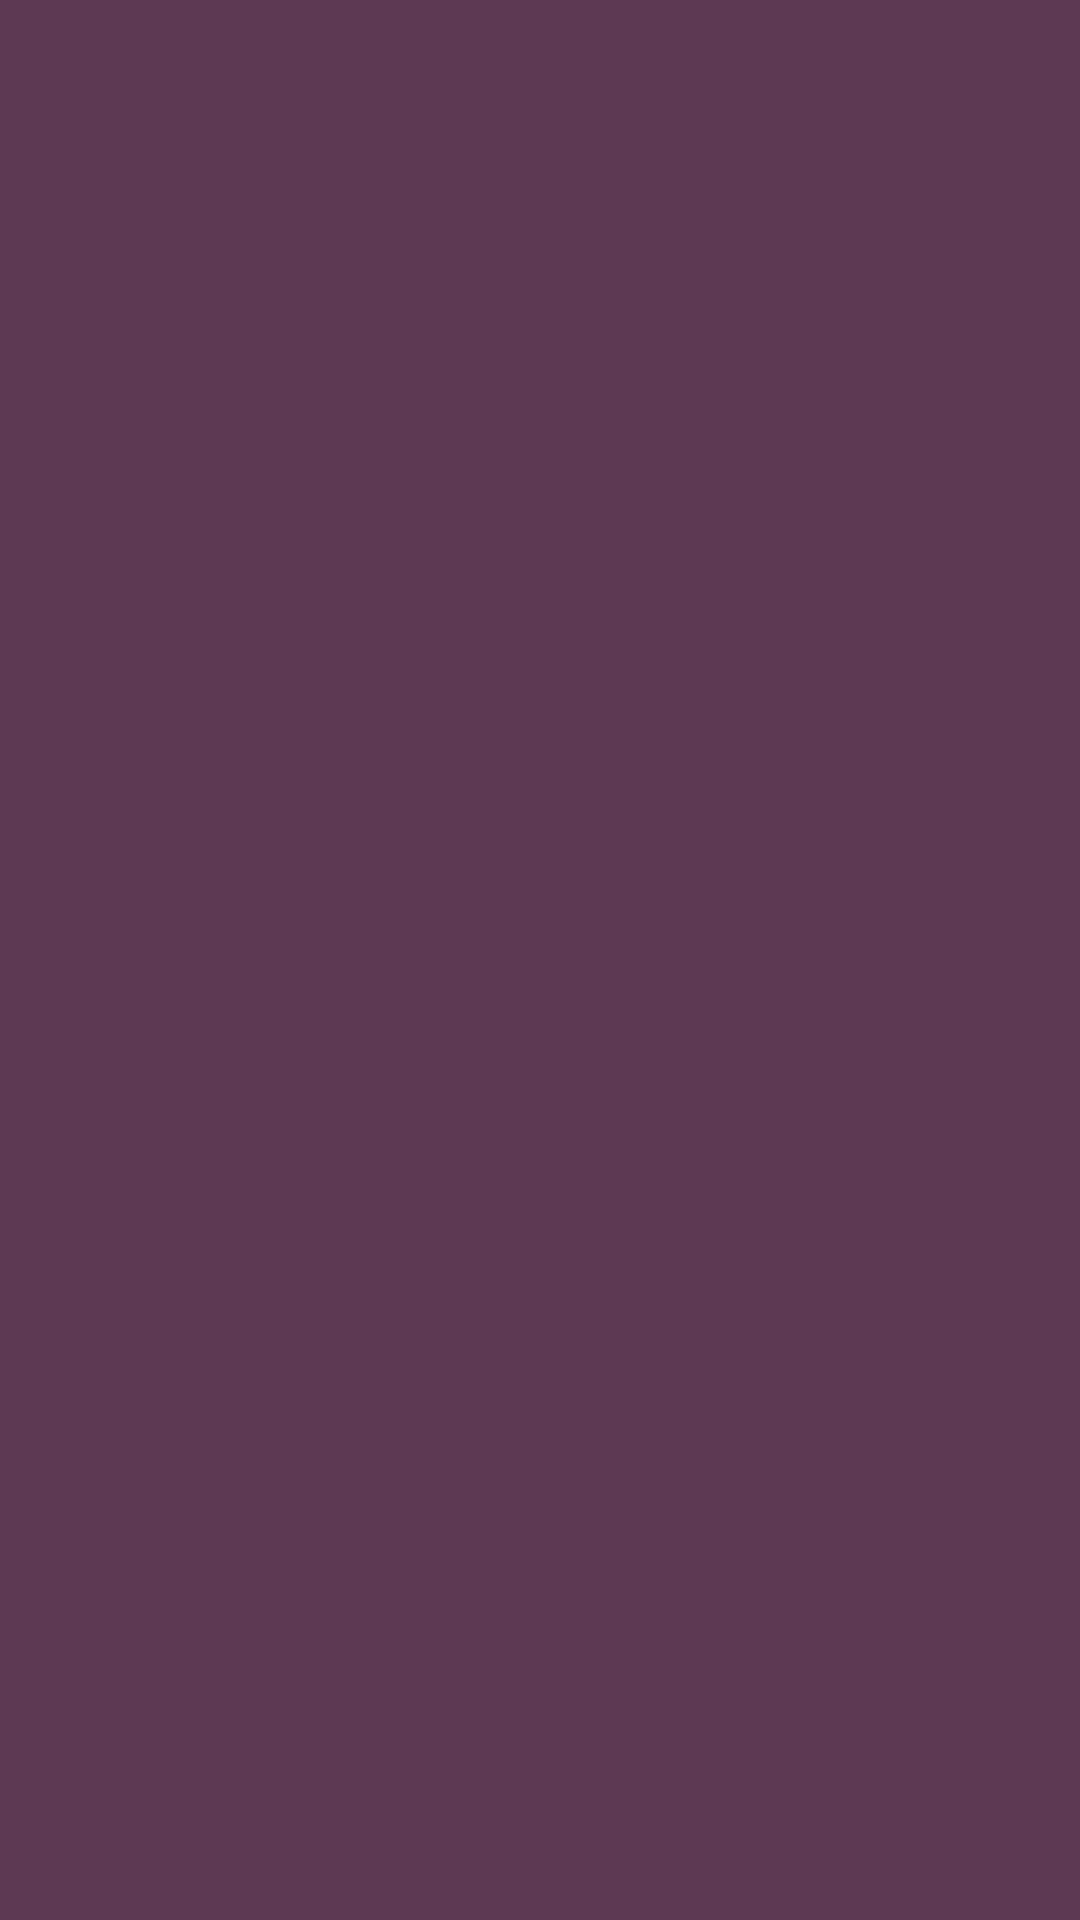 1080x1920 Dark Byzantium Solid Color Background